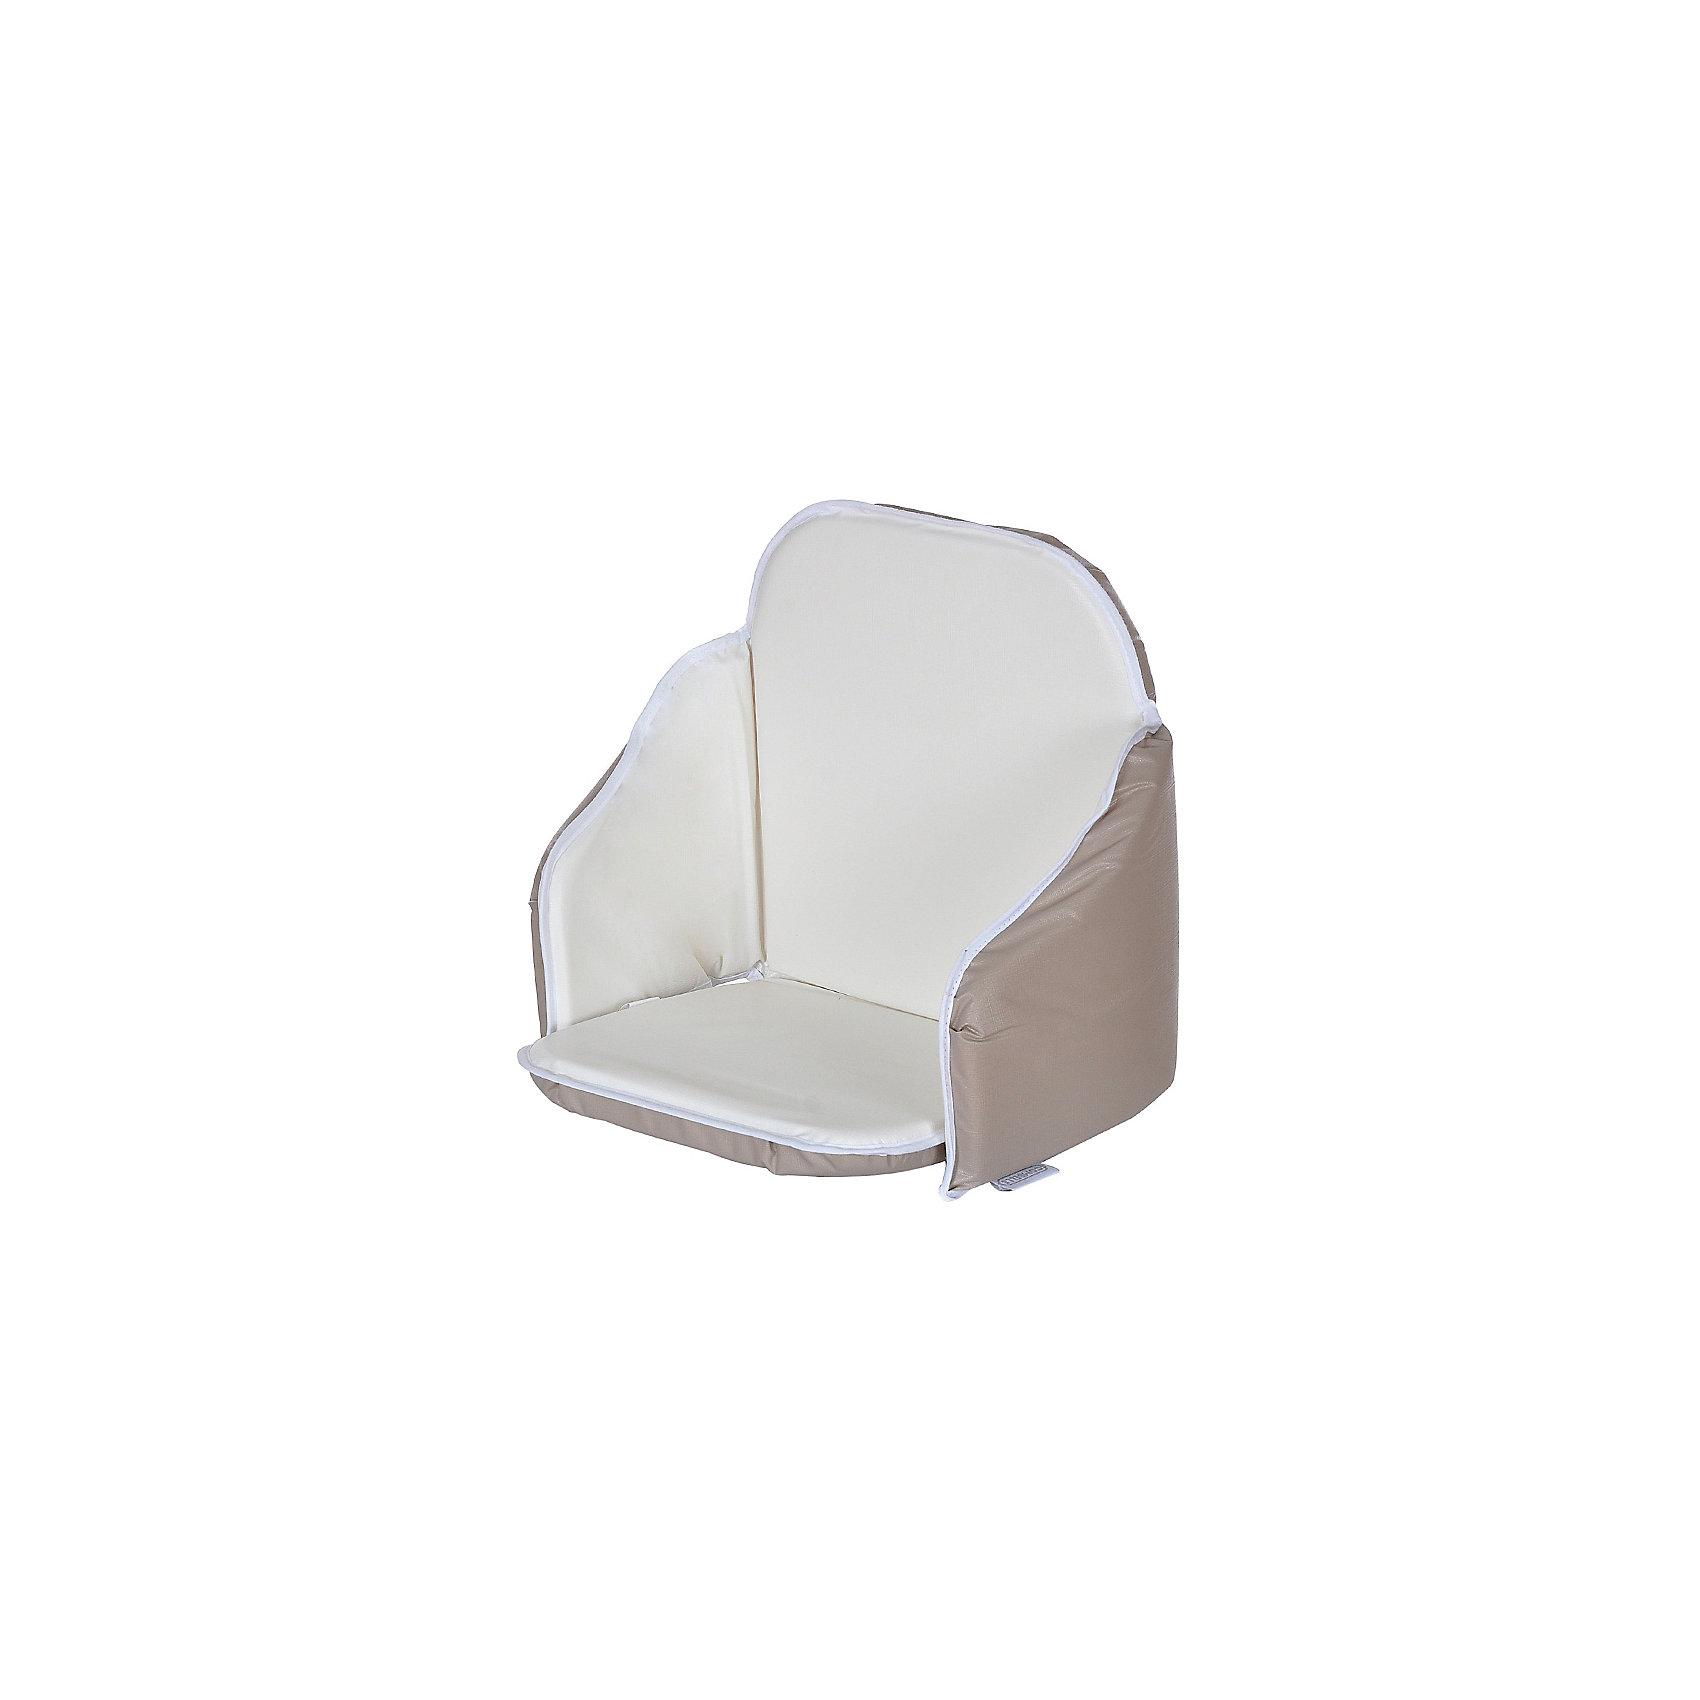 Вкладыш для стульчика-трансформера Transformable PVC, Combelle от myToys